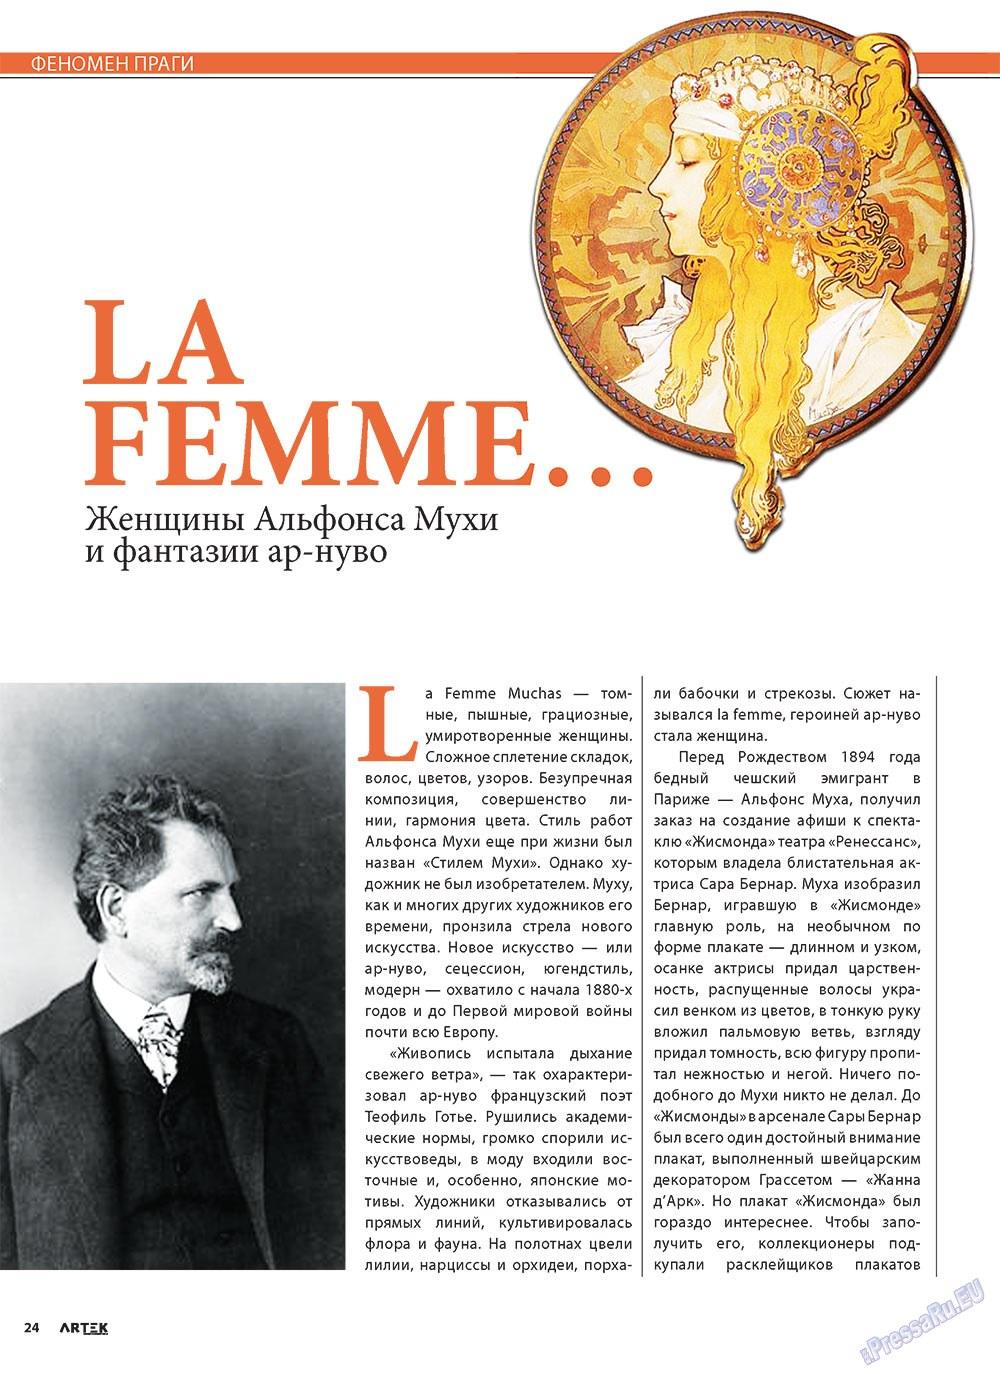 Артек (журнал). 2010 год, номер 6, стр. 26